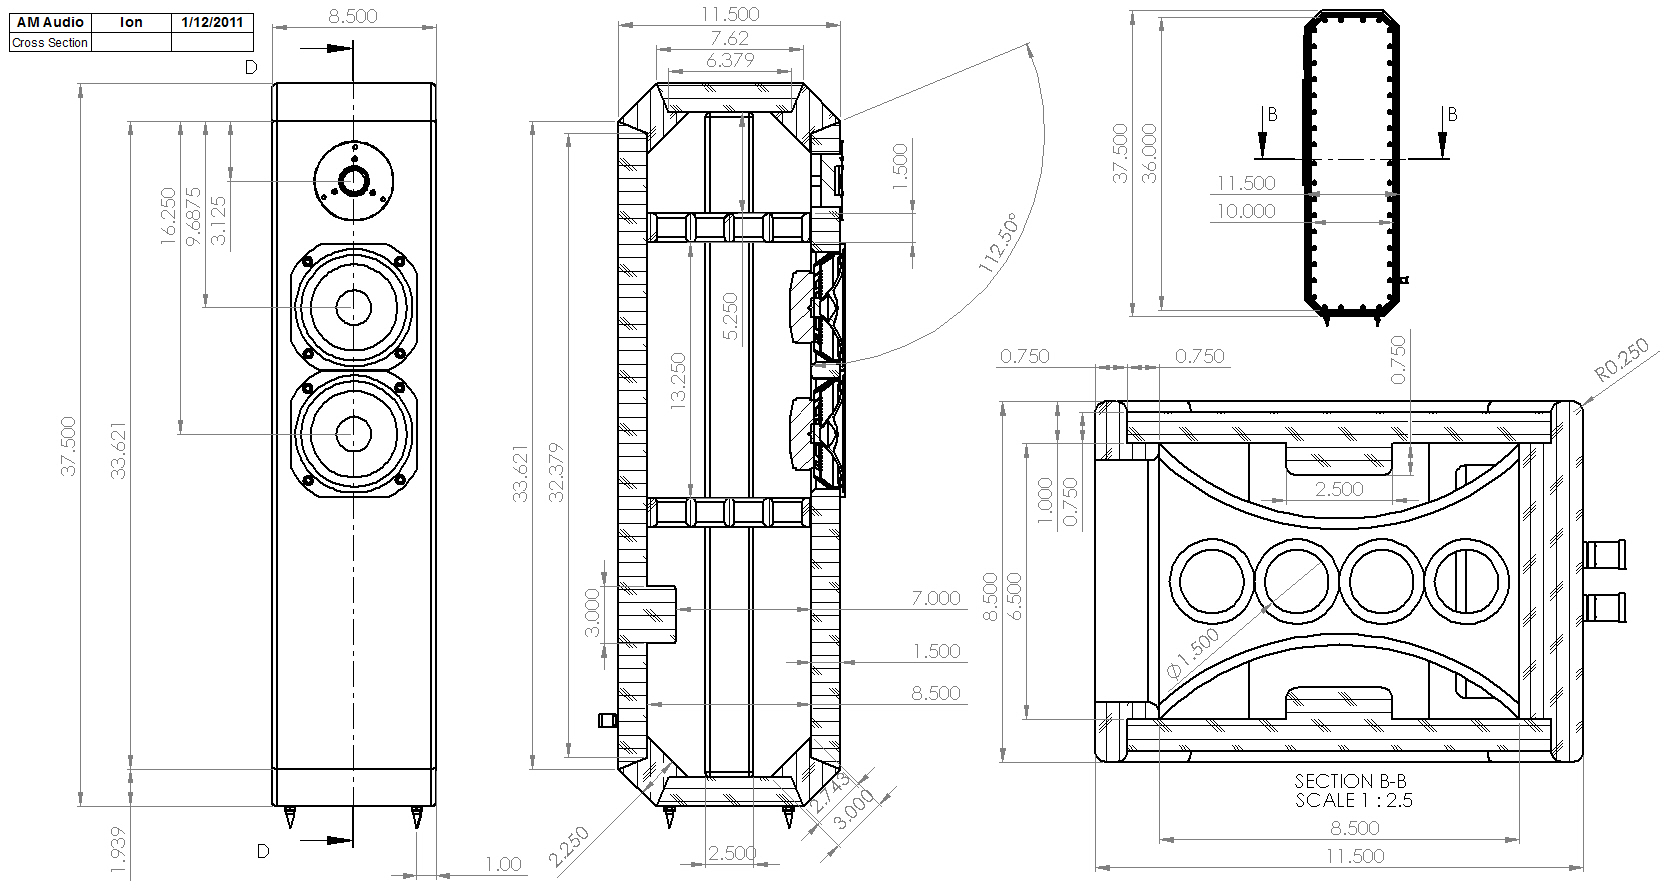 Dual Enclosure :: Loudspeaker Enclosure Design and Construction